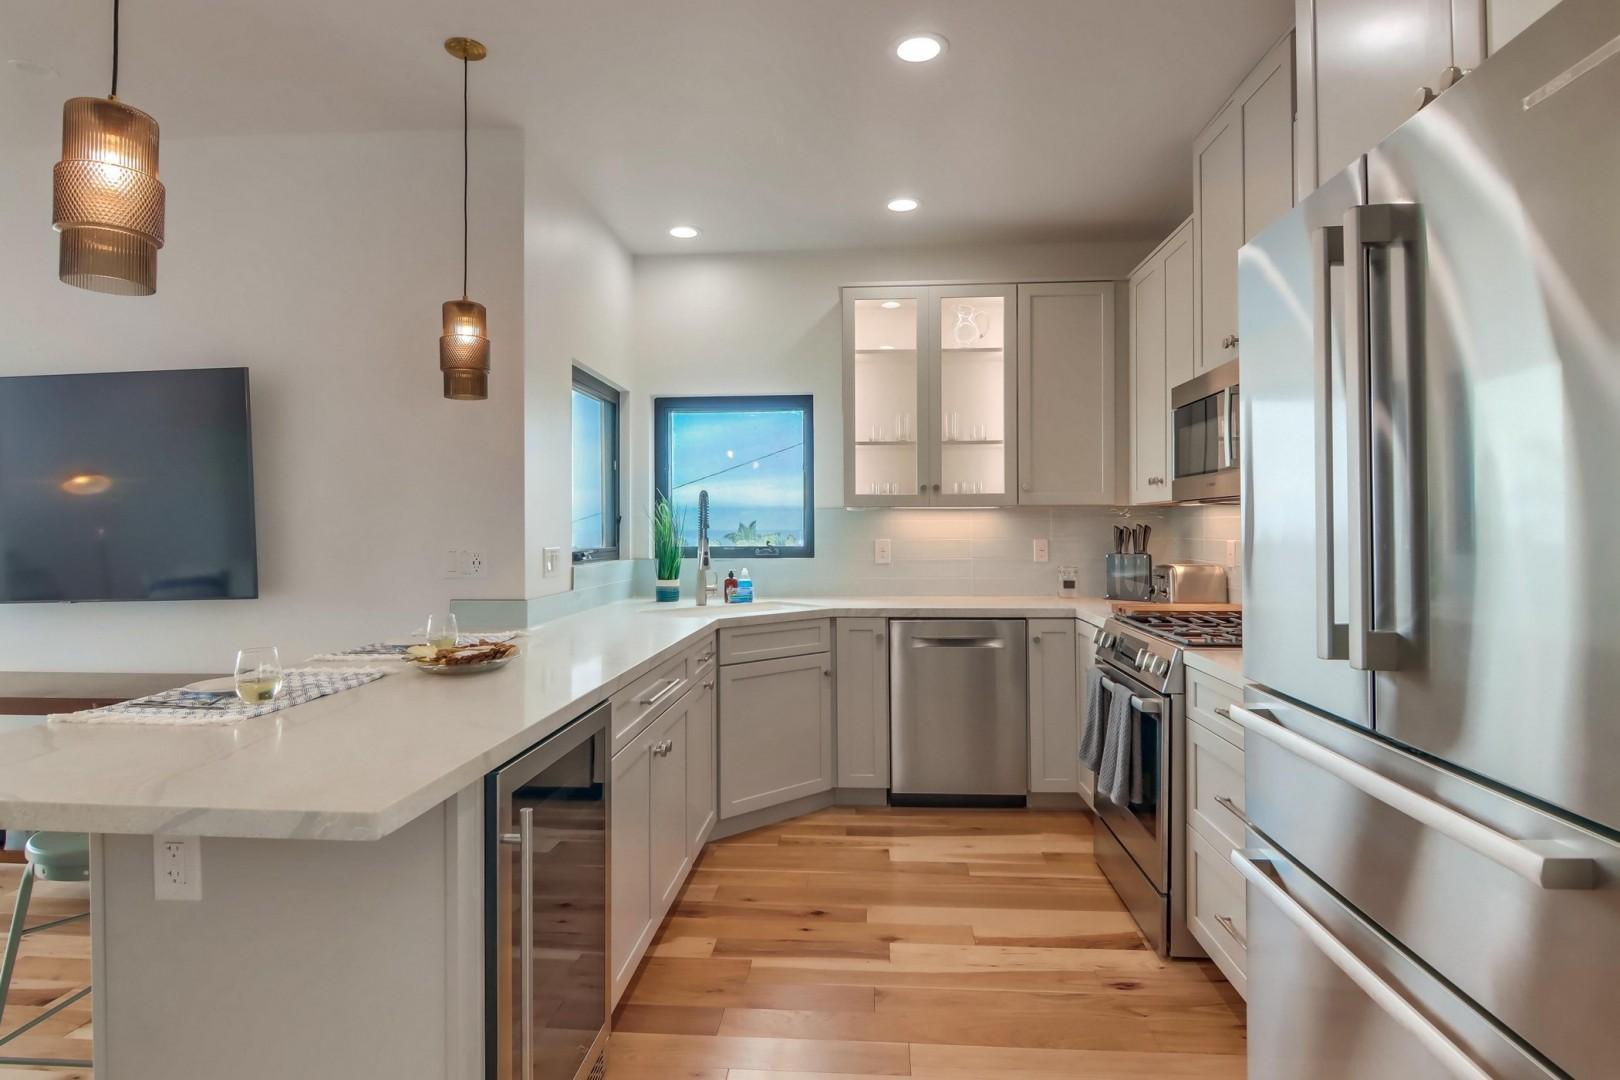 Sleek kitchen with stainless appliances